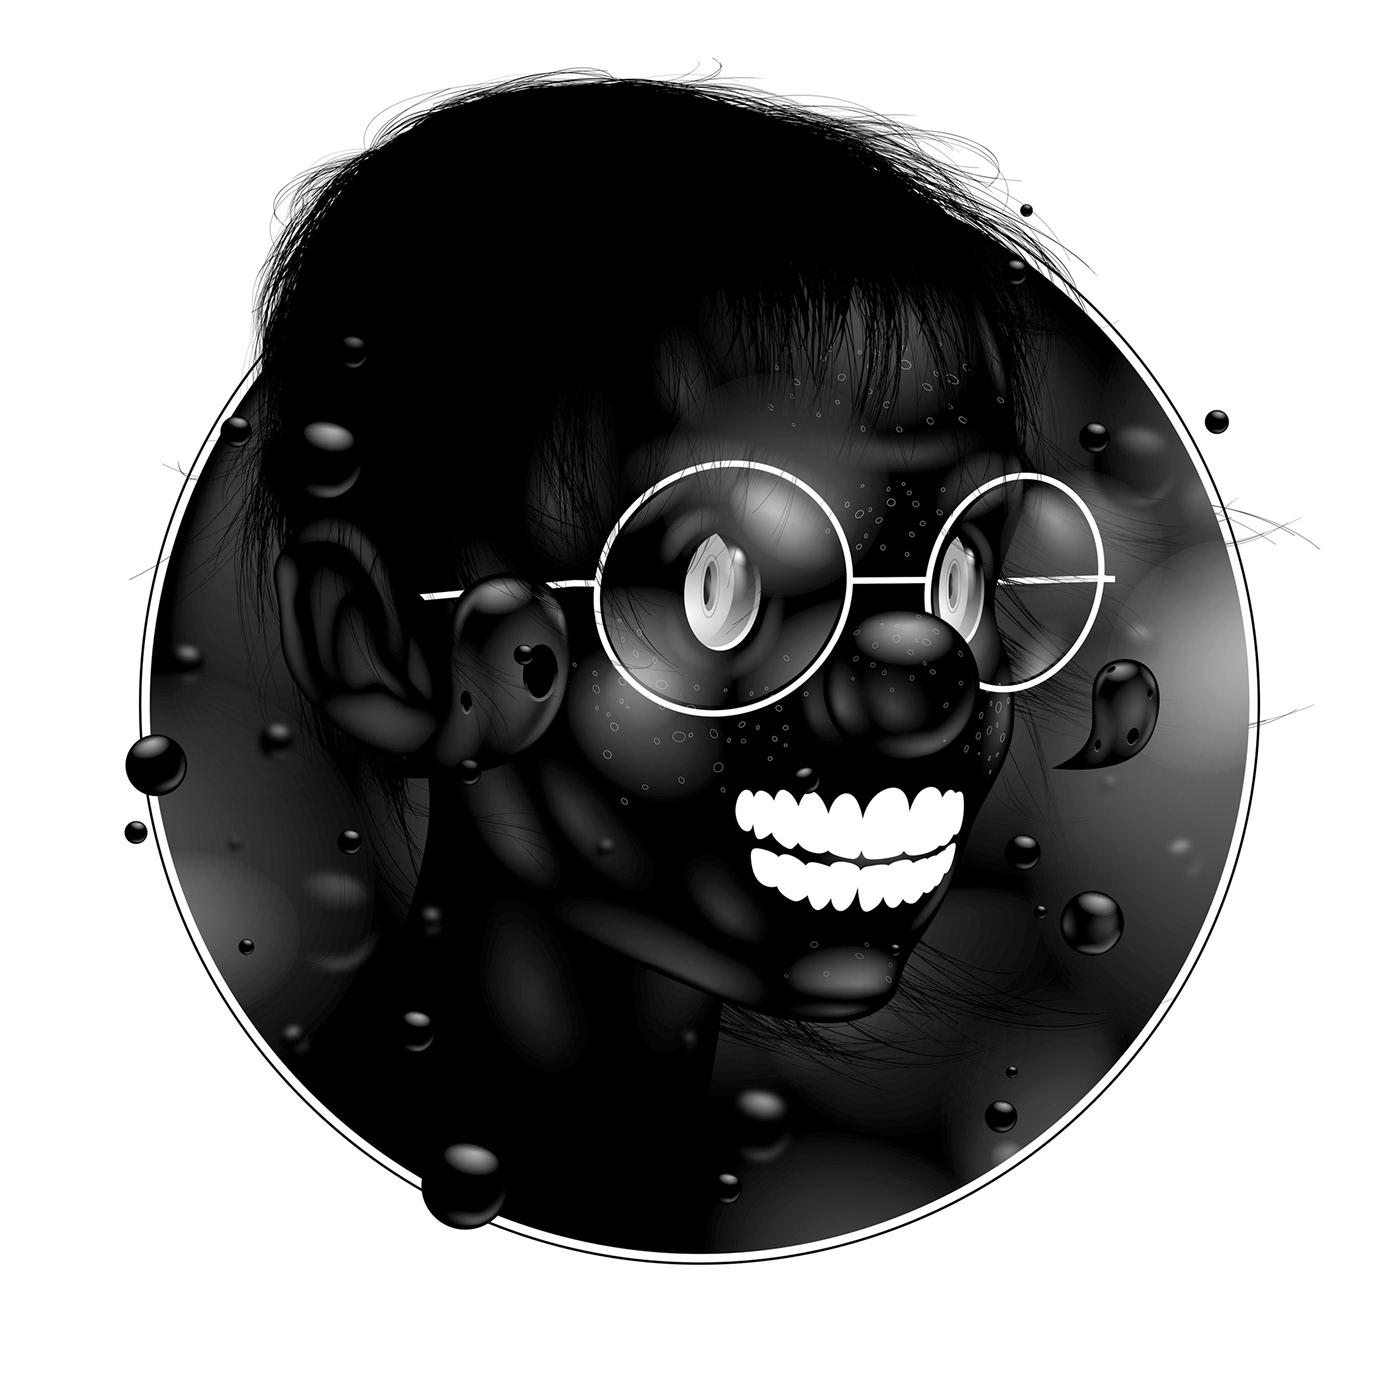 Image may contain: cartoon, glasses and human face